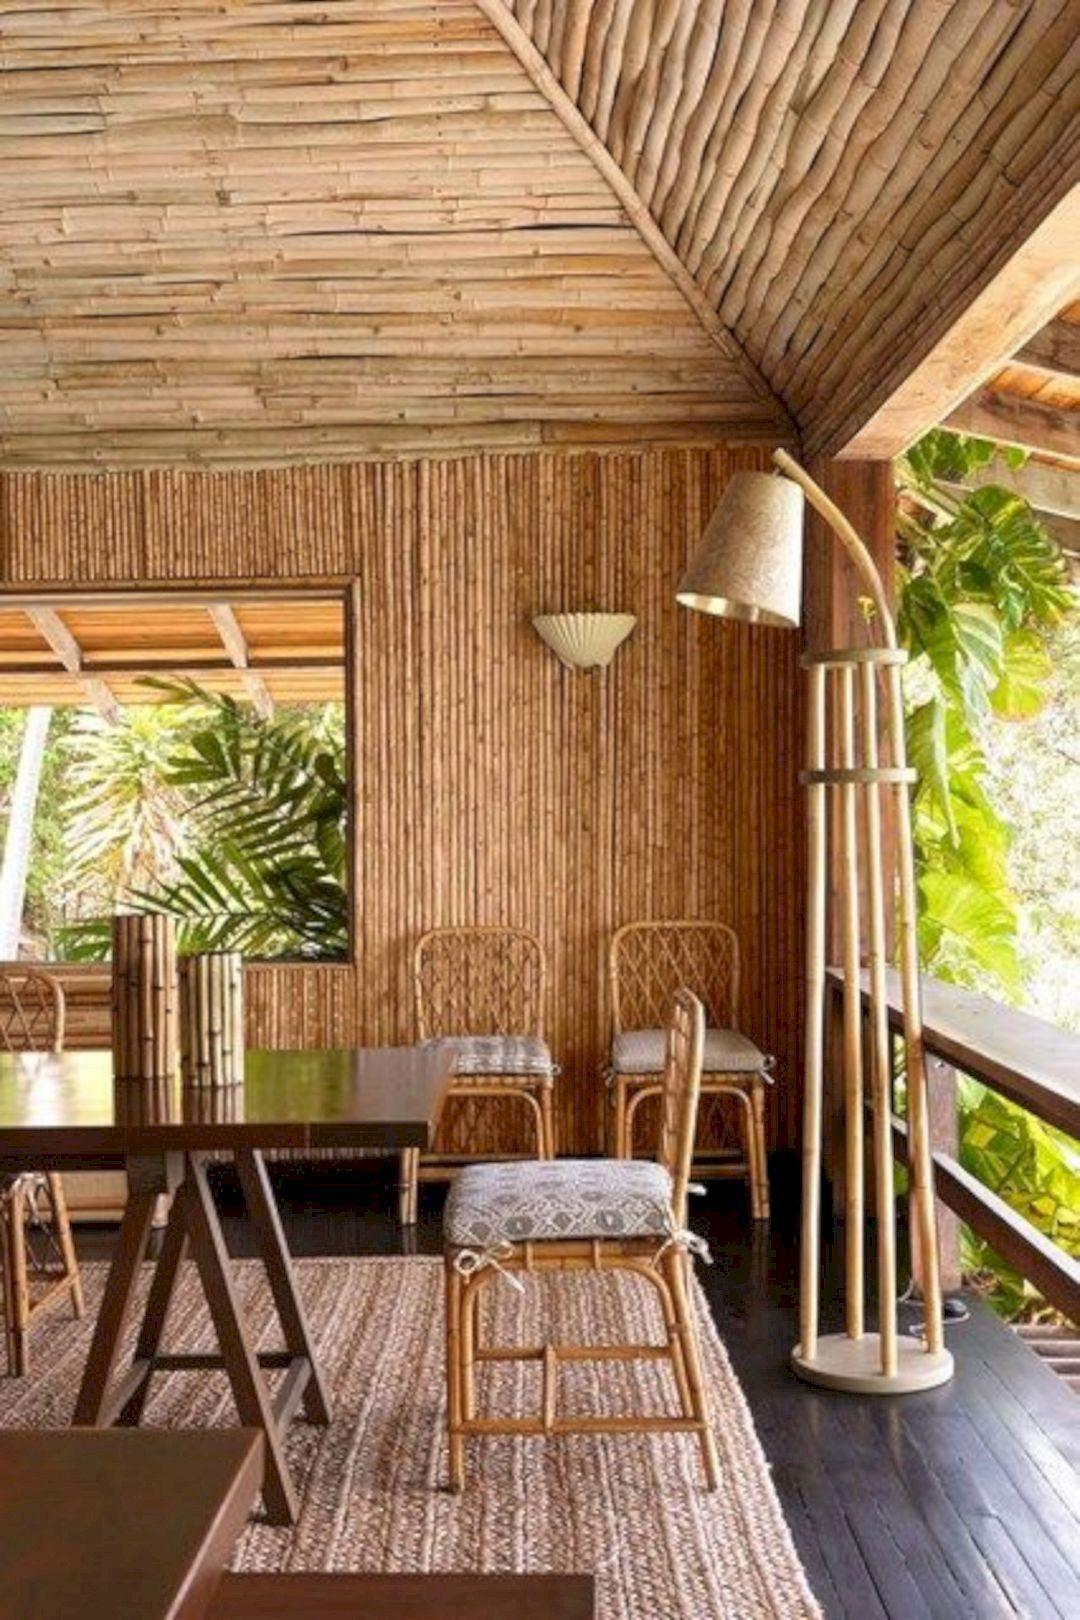 Summer House Interior Design Ideas From Berlin: 15 Stylish Interior Design Ideas For Your Summer House